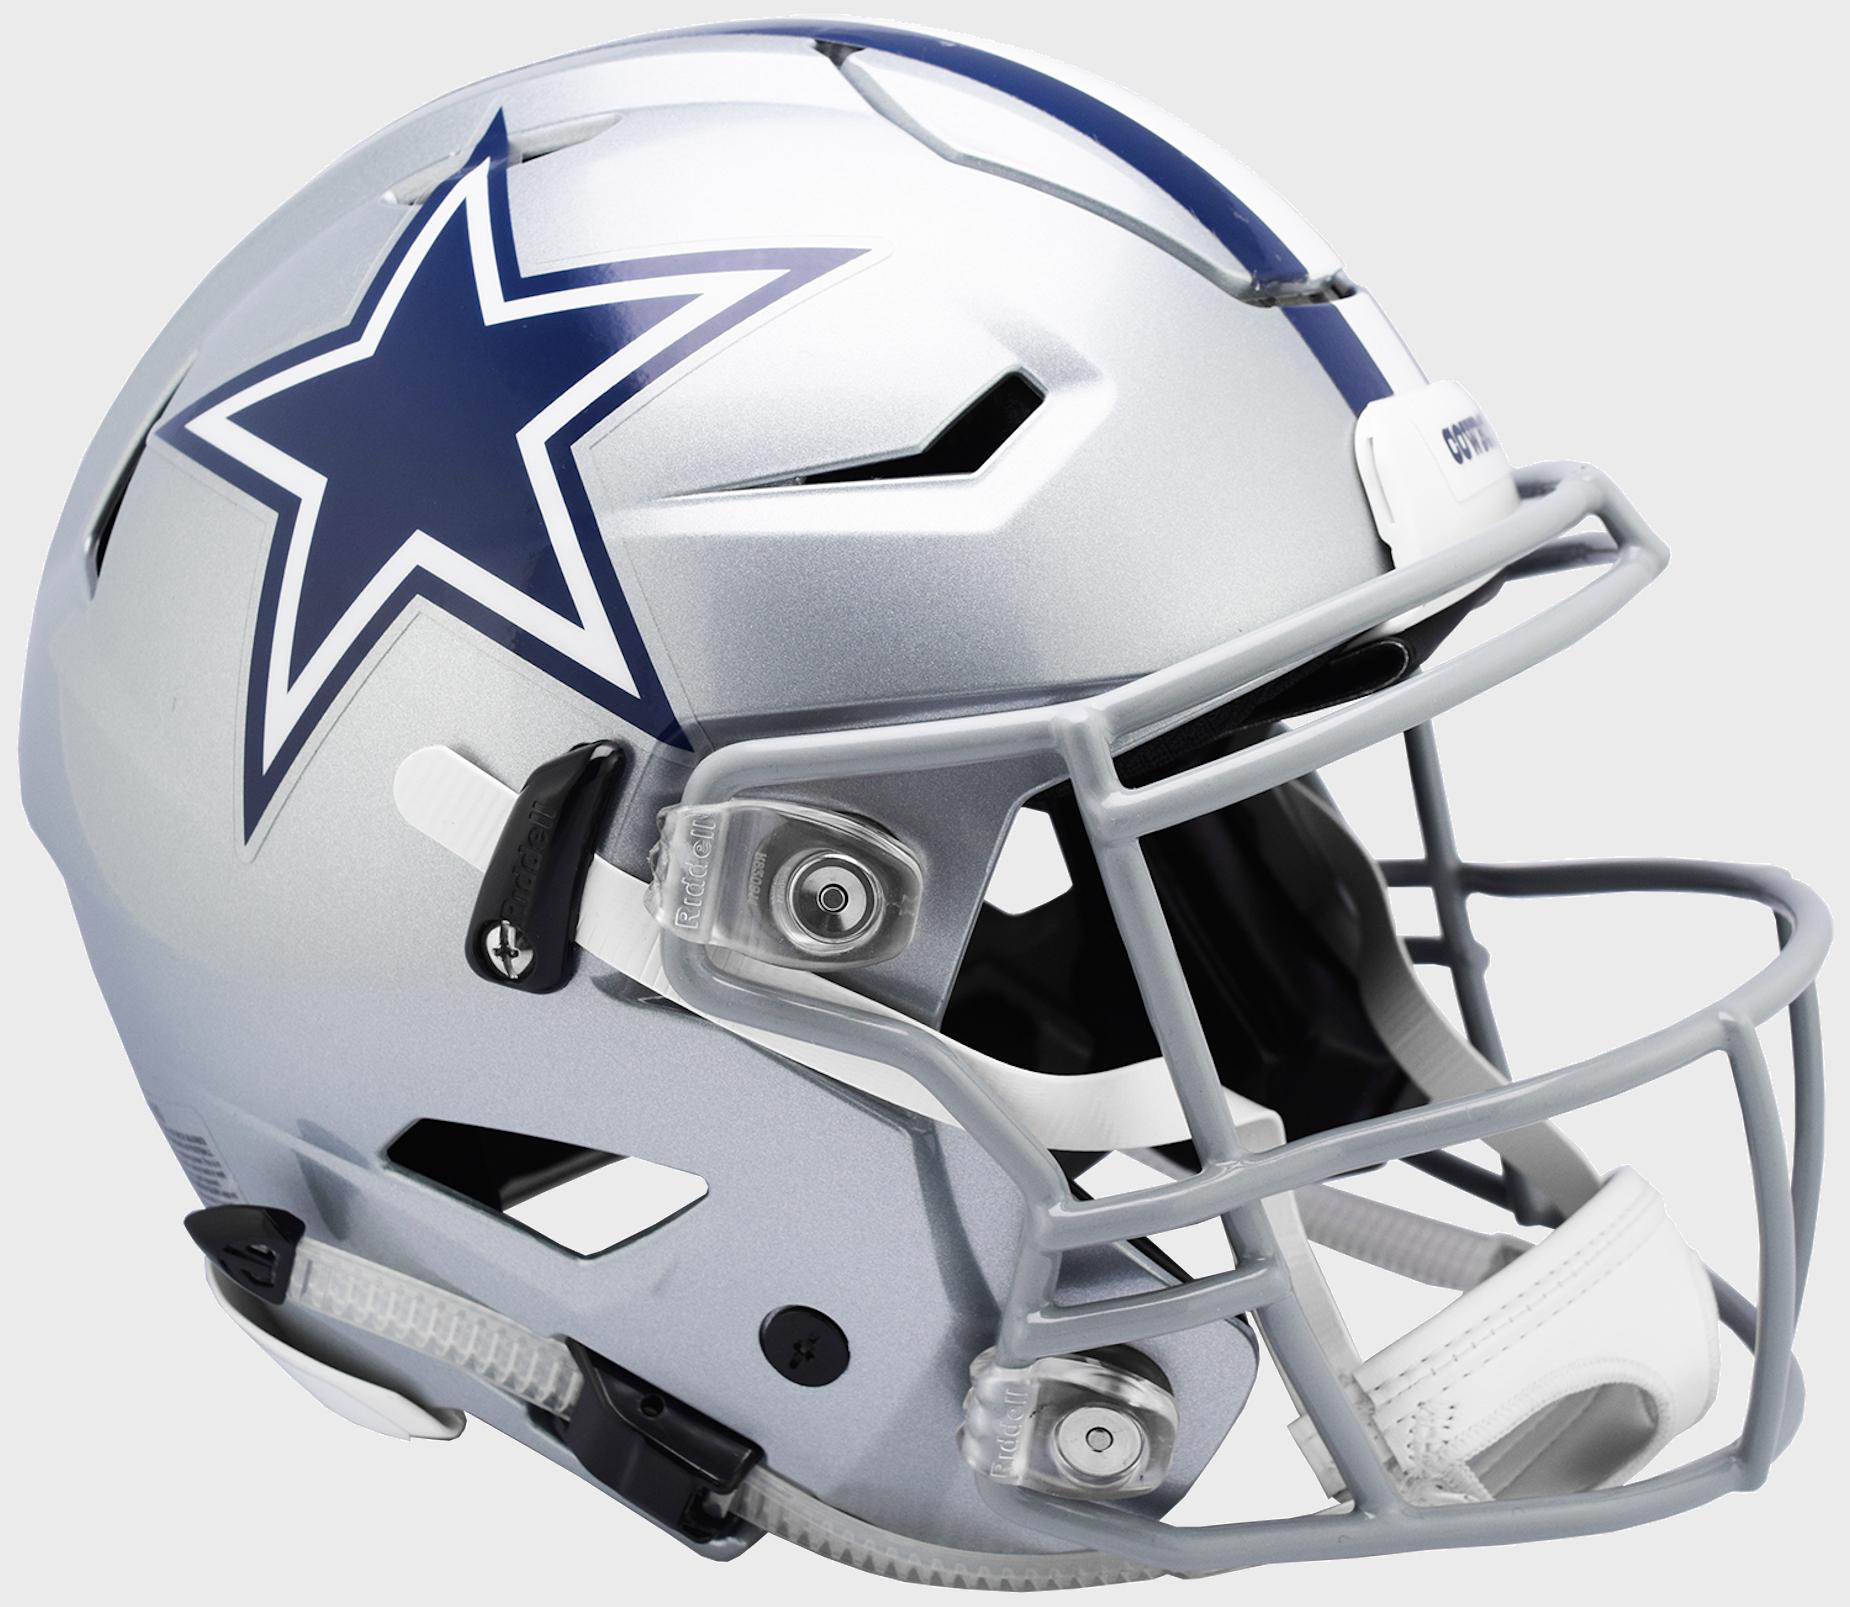 Dallas Cowboys SpeedFlex Football Helmet.